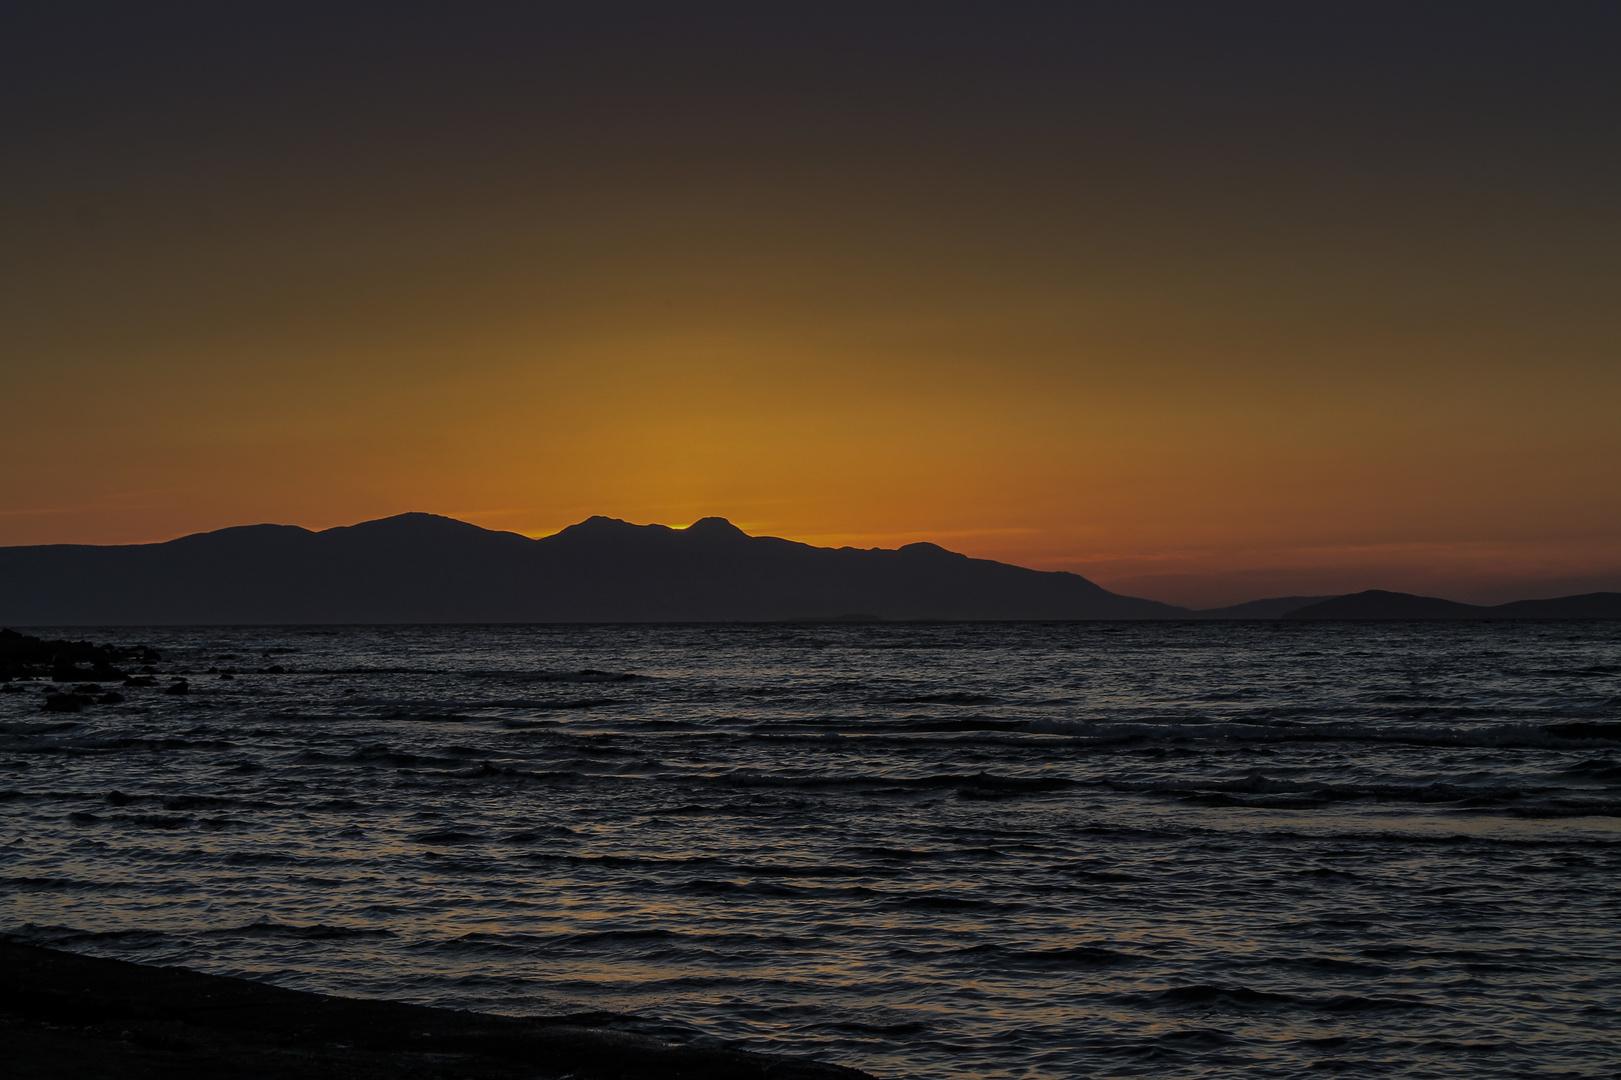 Sonnenuntergang in Cesme - Tr